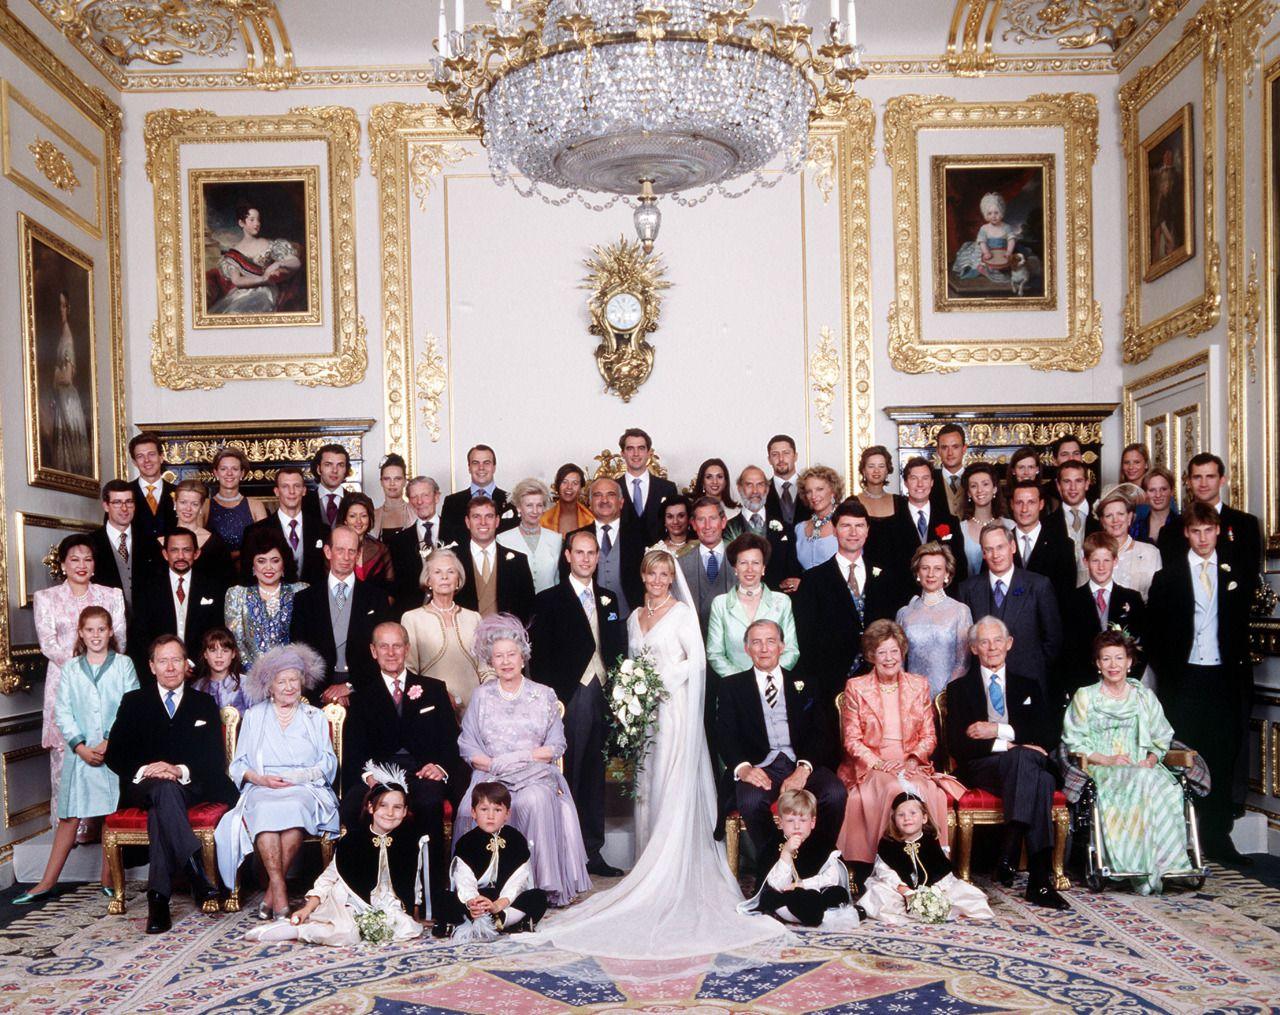 Prince Edward Wedding.1999 Prince Edward Earl Of Wessex Marries Sophie Rhys